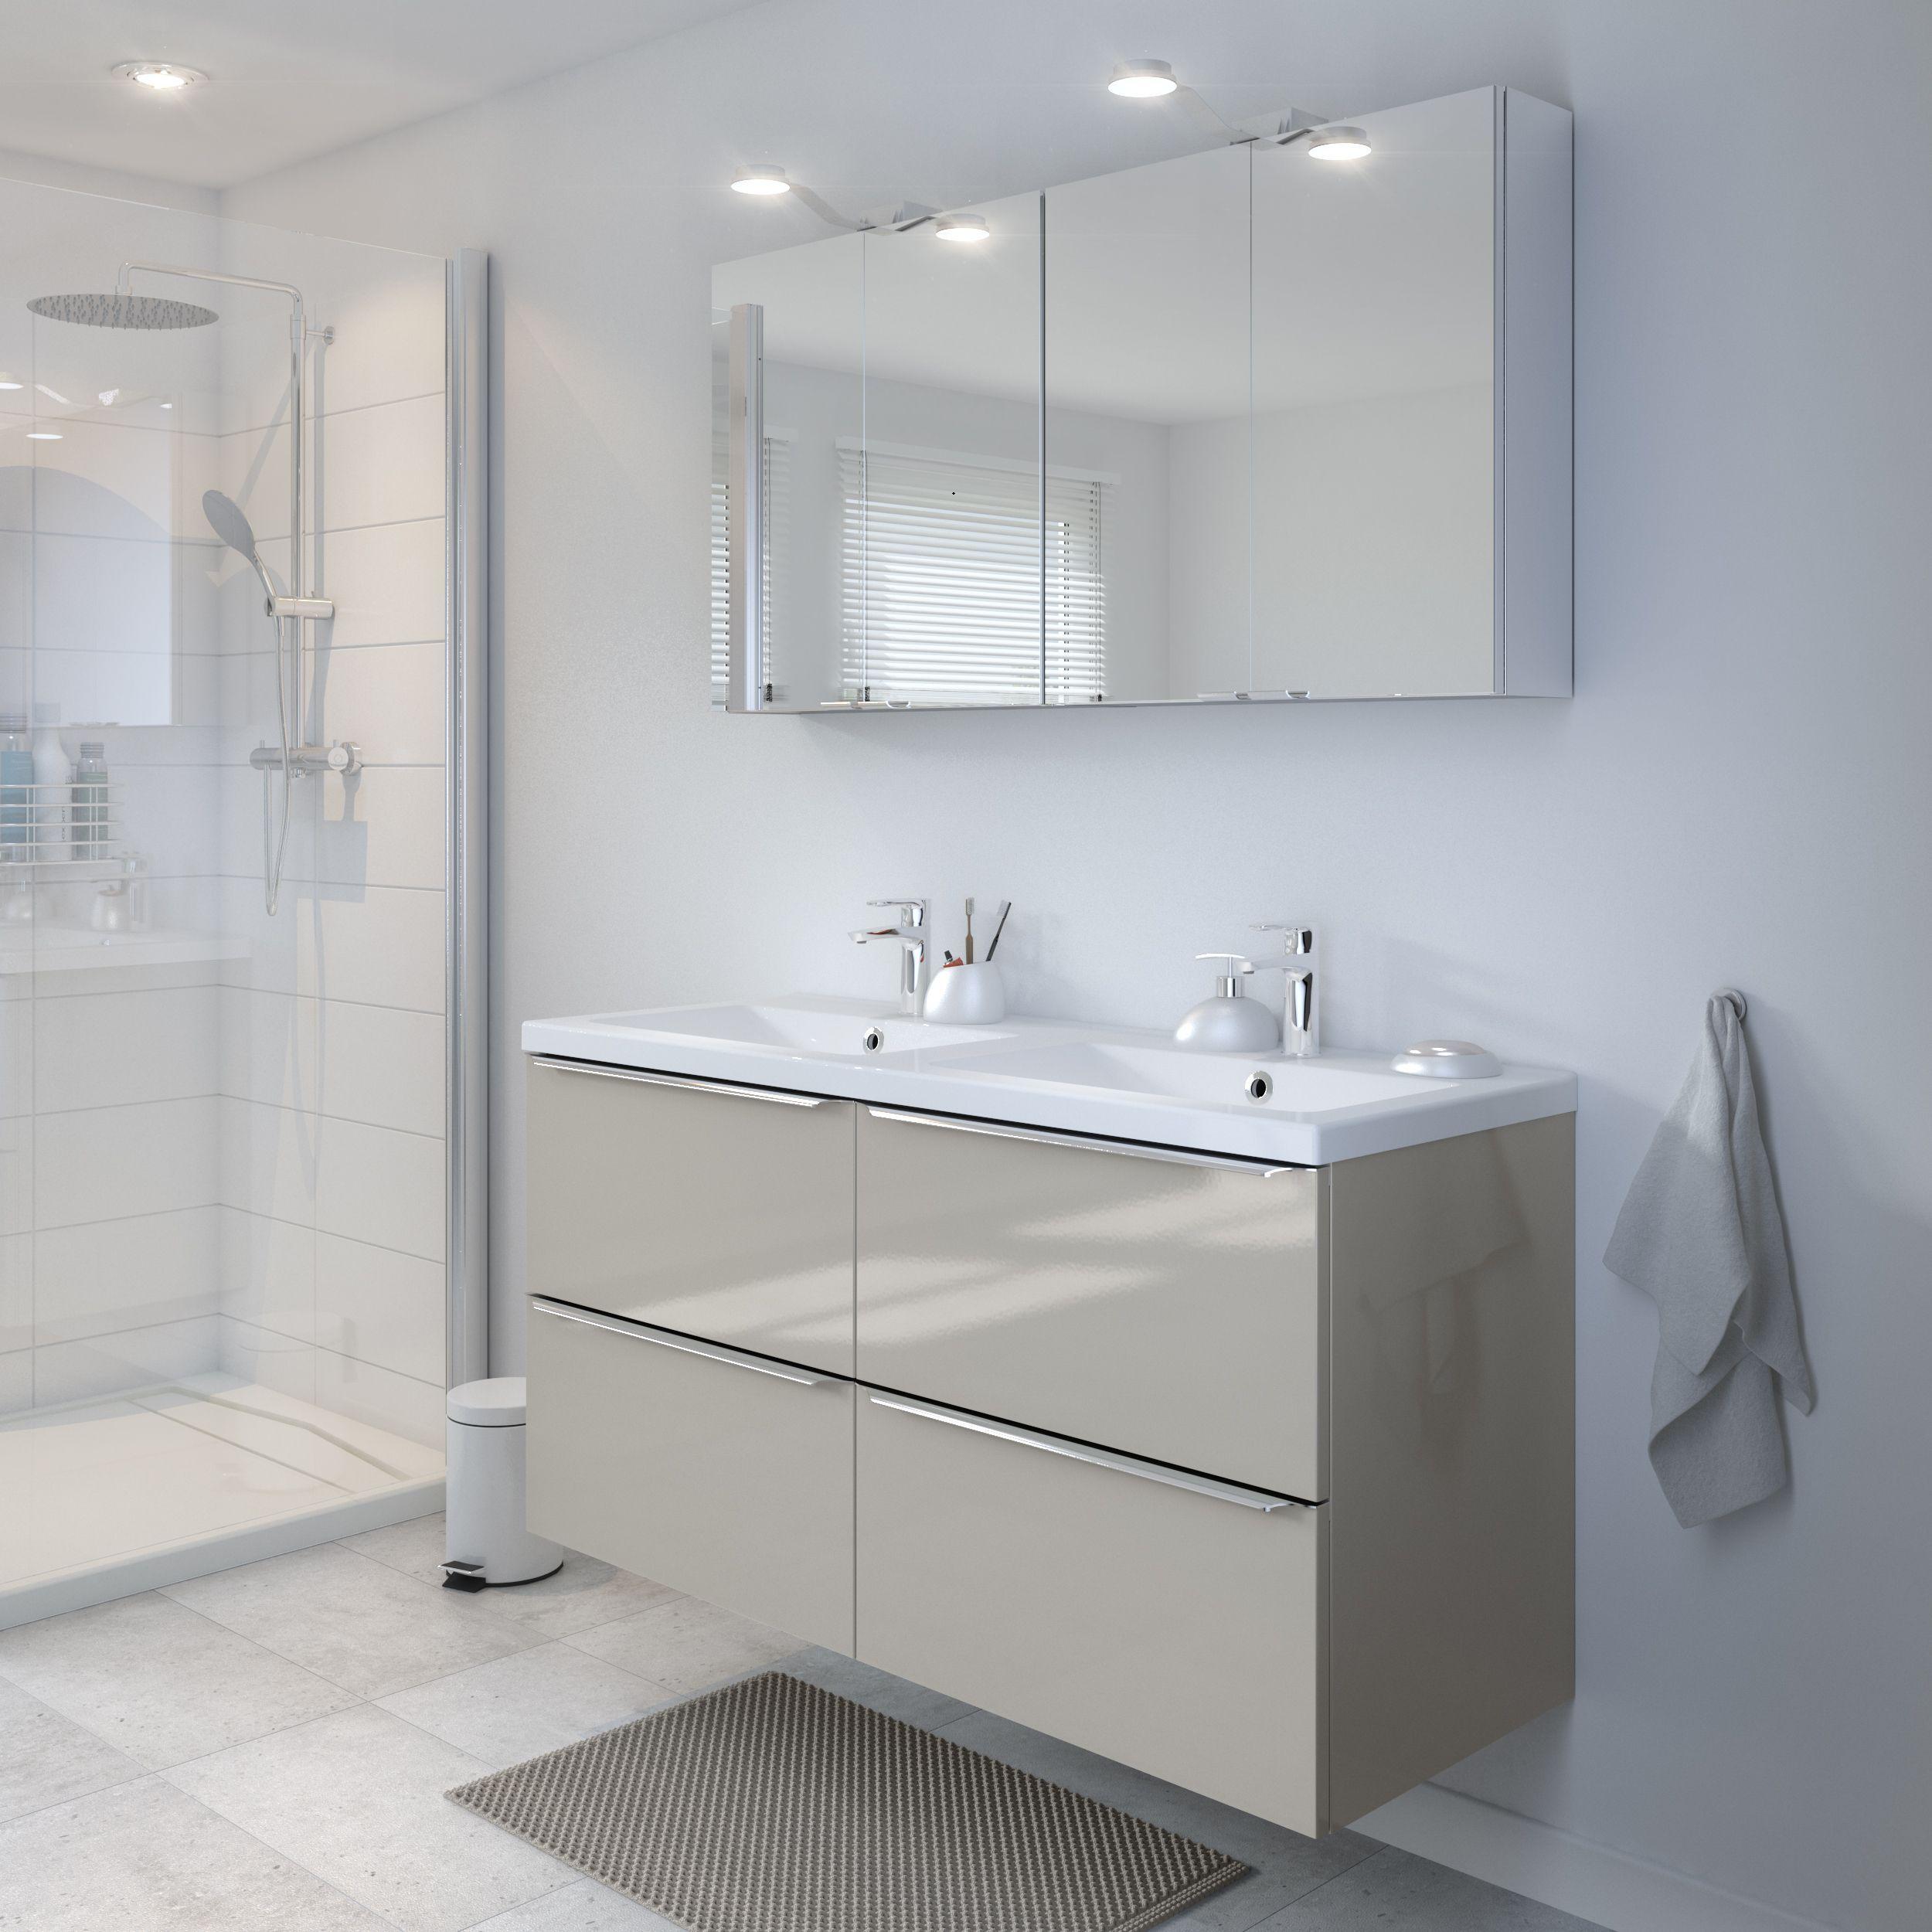 Goodhome Imandra Gloss Taupe Vanity Basin Unit W 1200mm Vanity Basin Goodhome Basin Unit